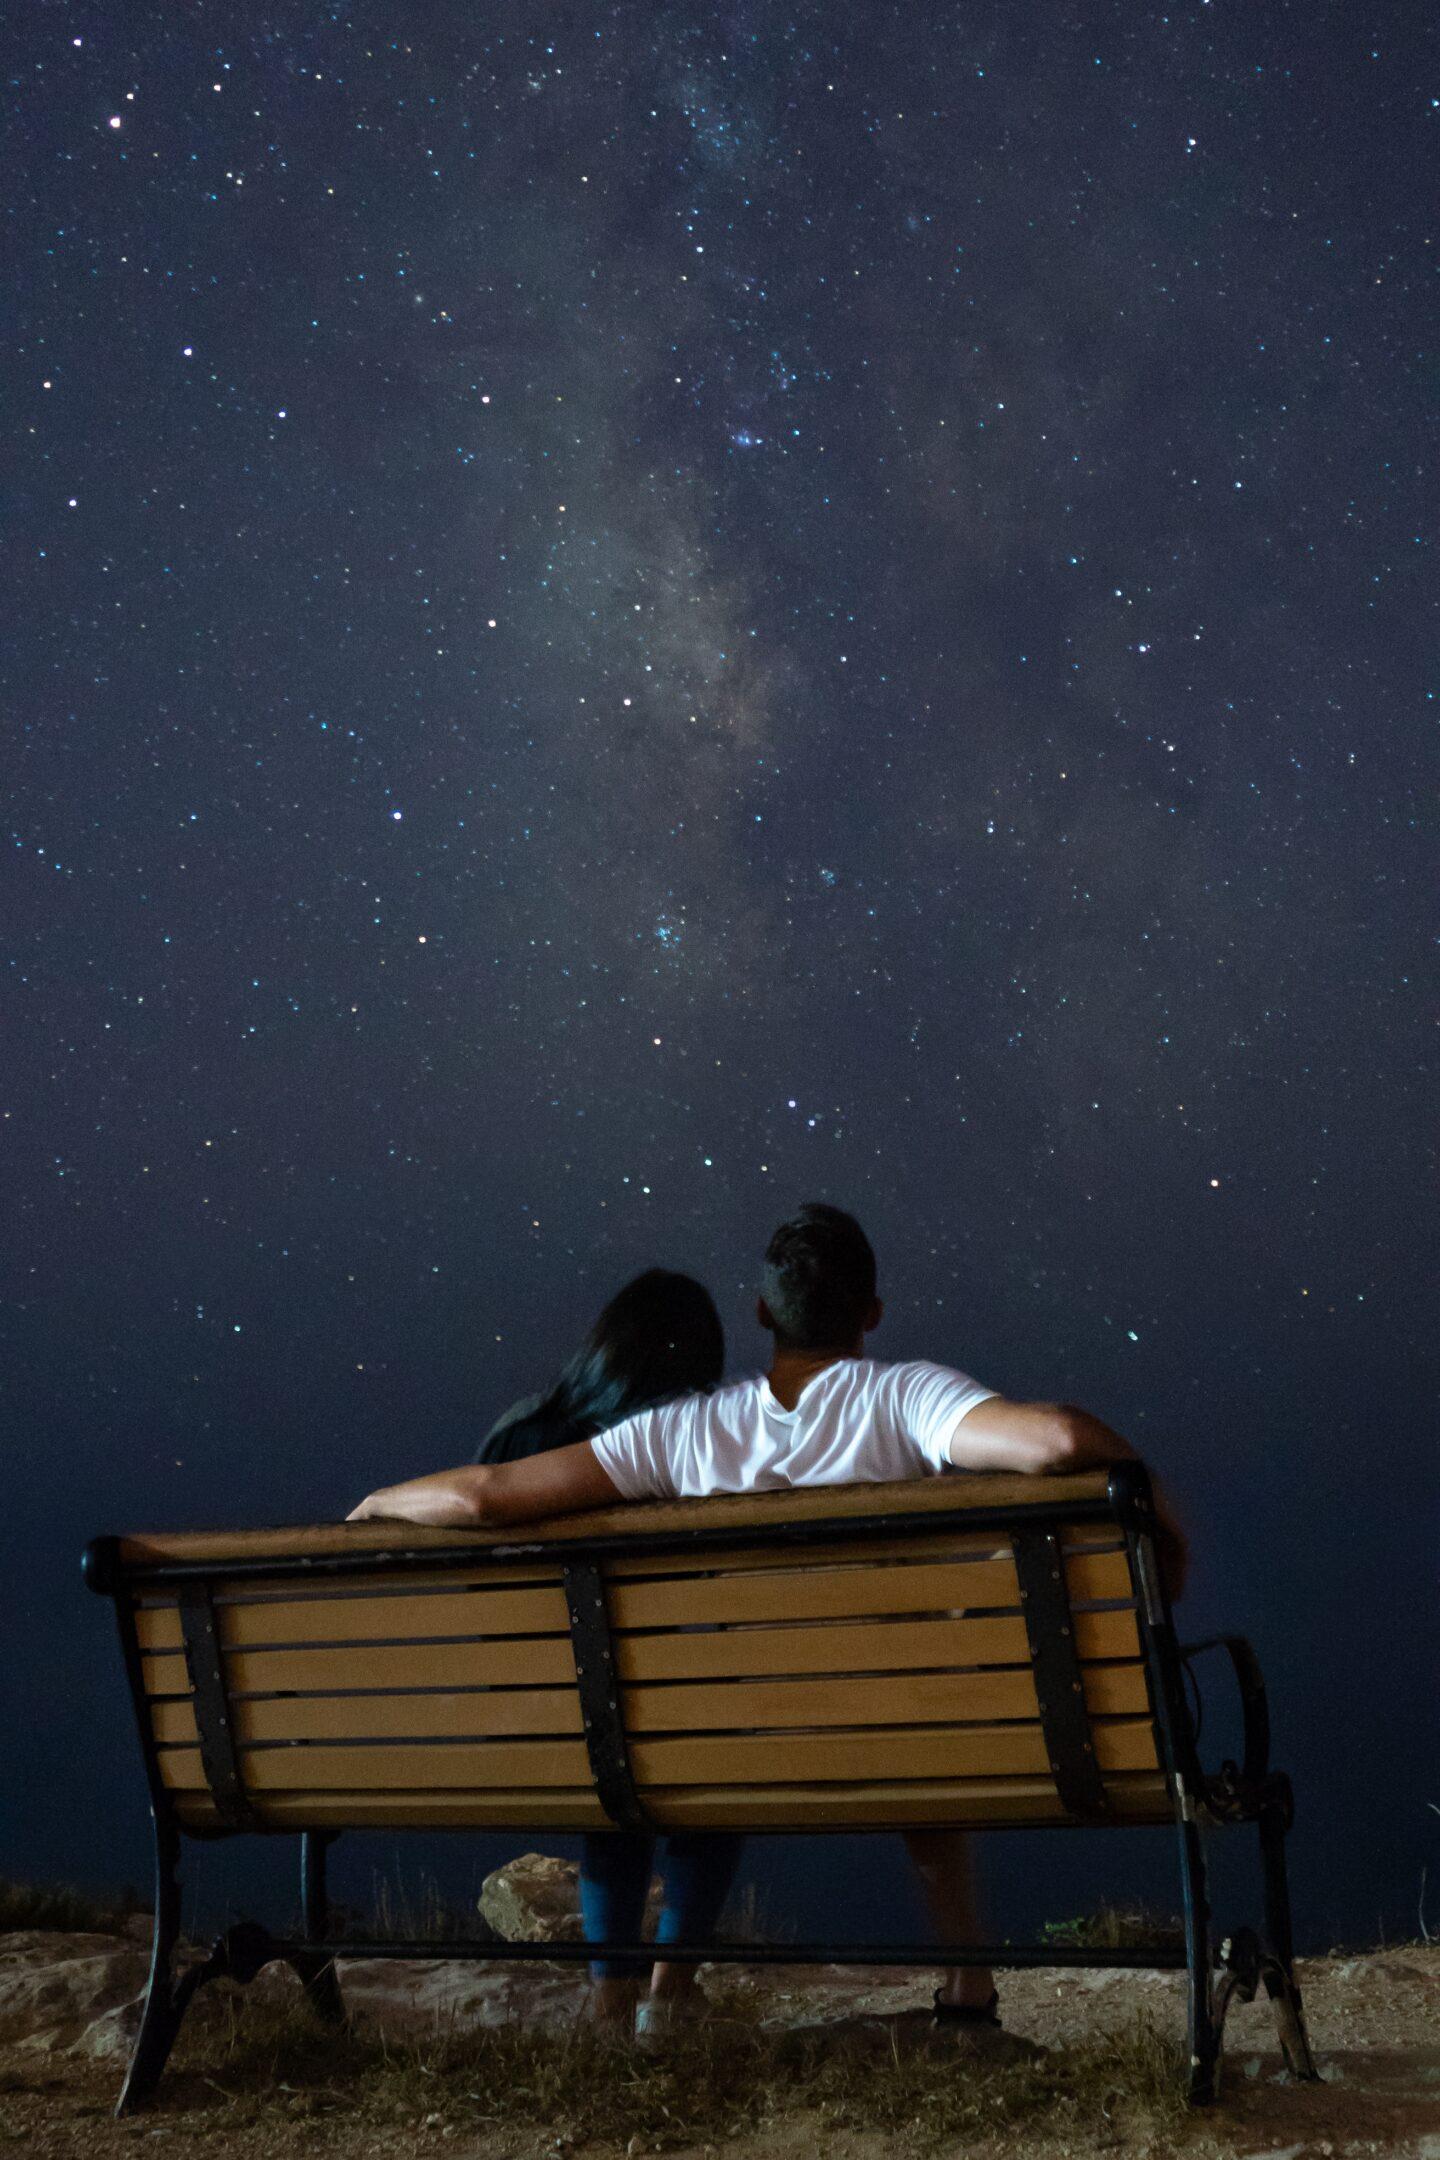 Stargazing is an Amazing Third Date Idea